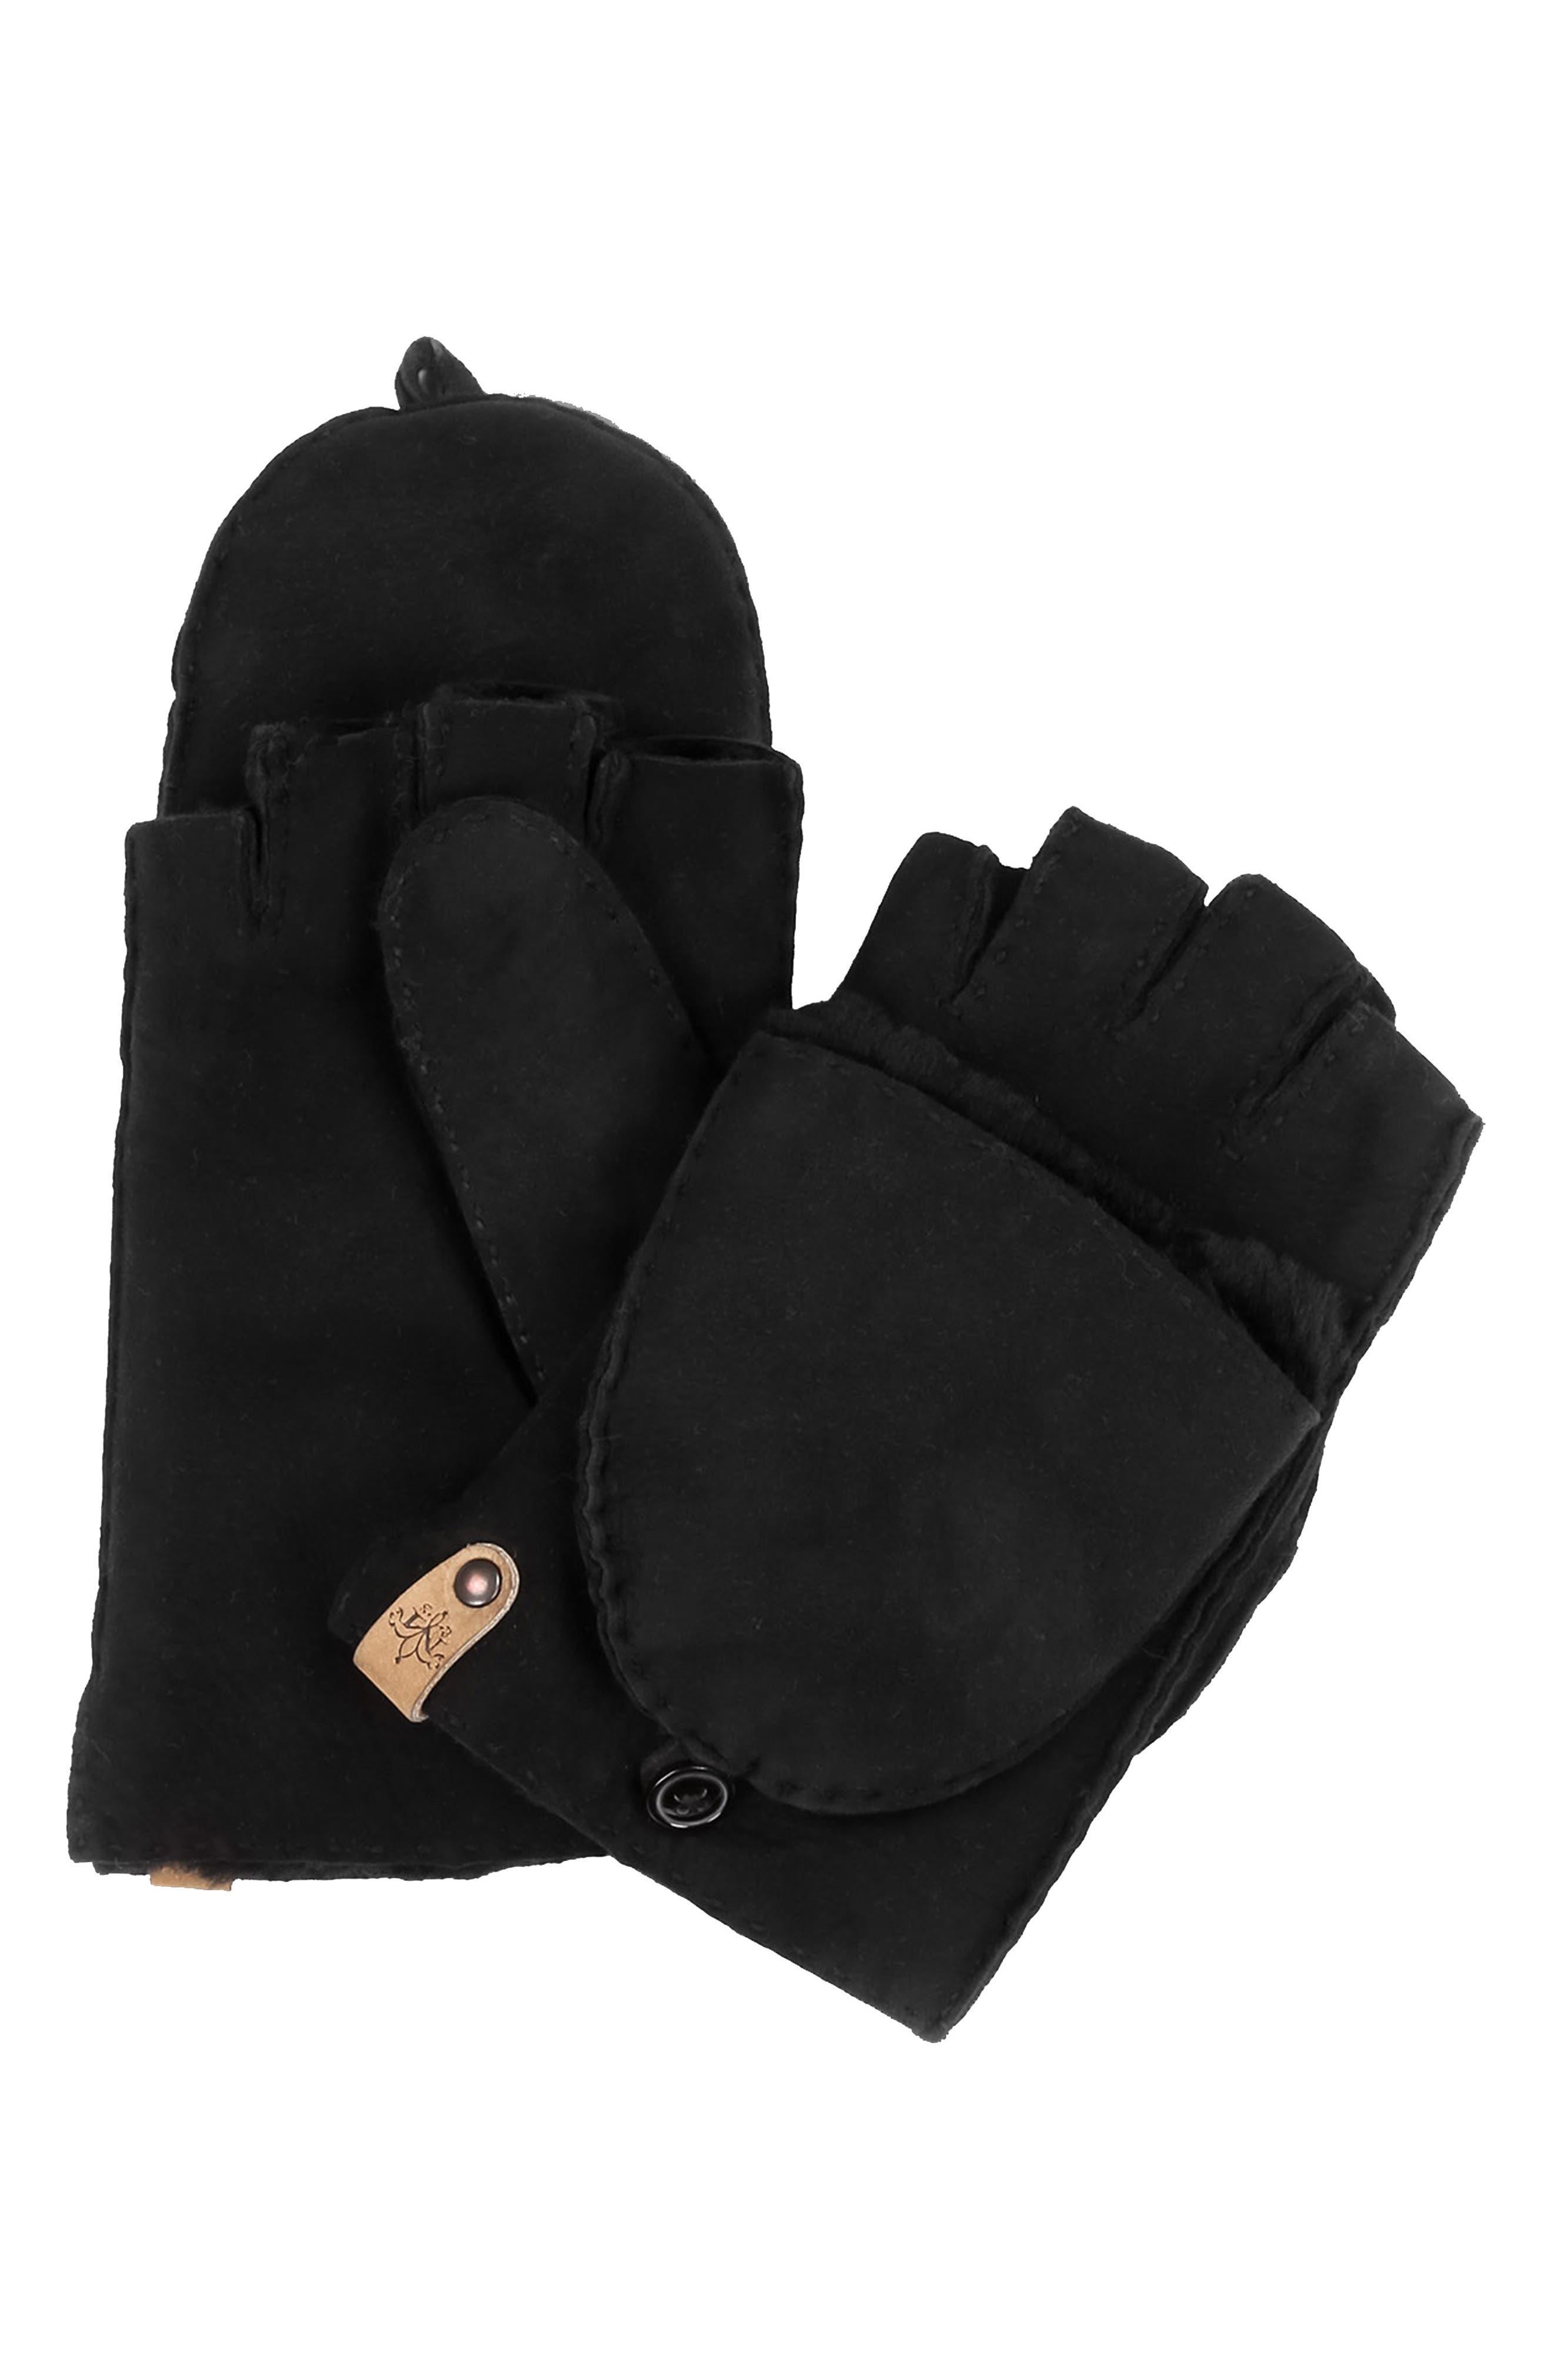 Orea Pop Top Sheepskin Leather Mittens,                             Main thumbnail 1, color,                             BLACK